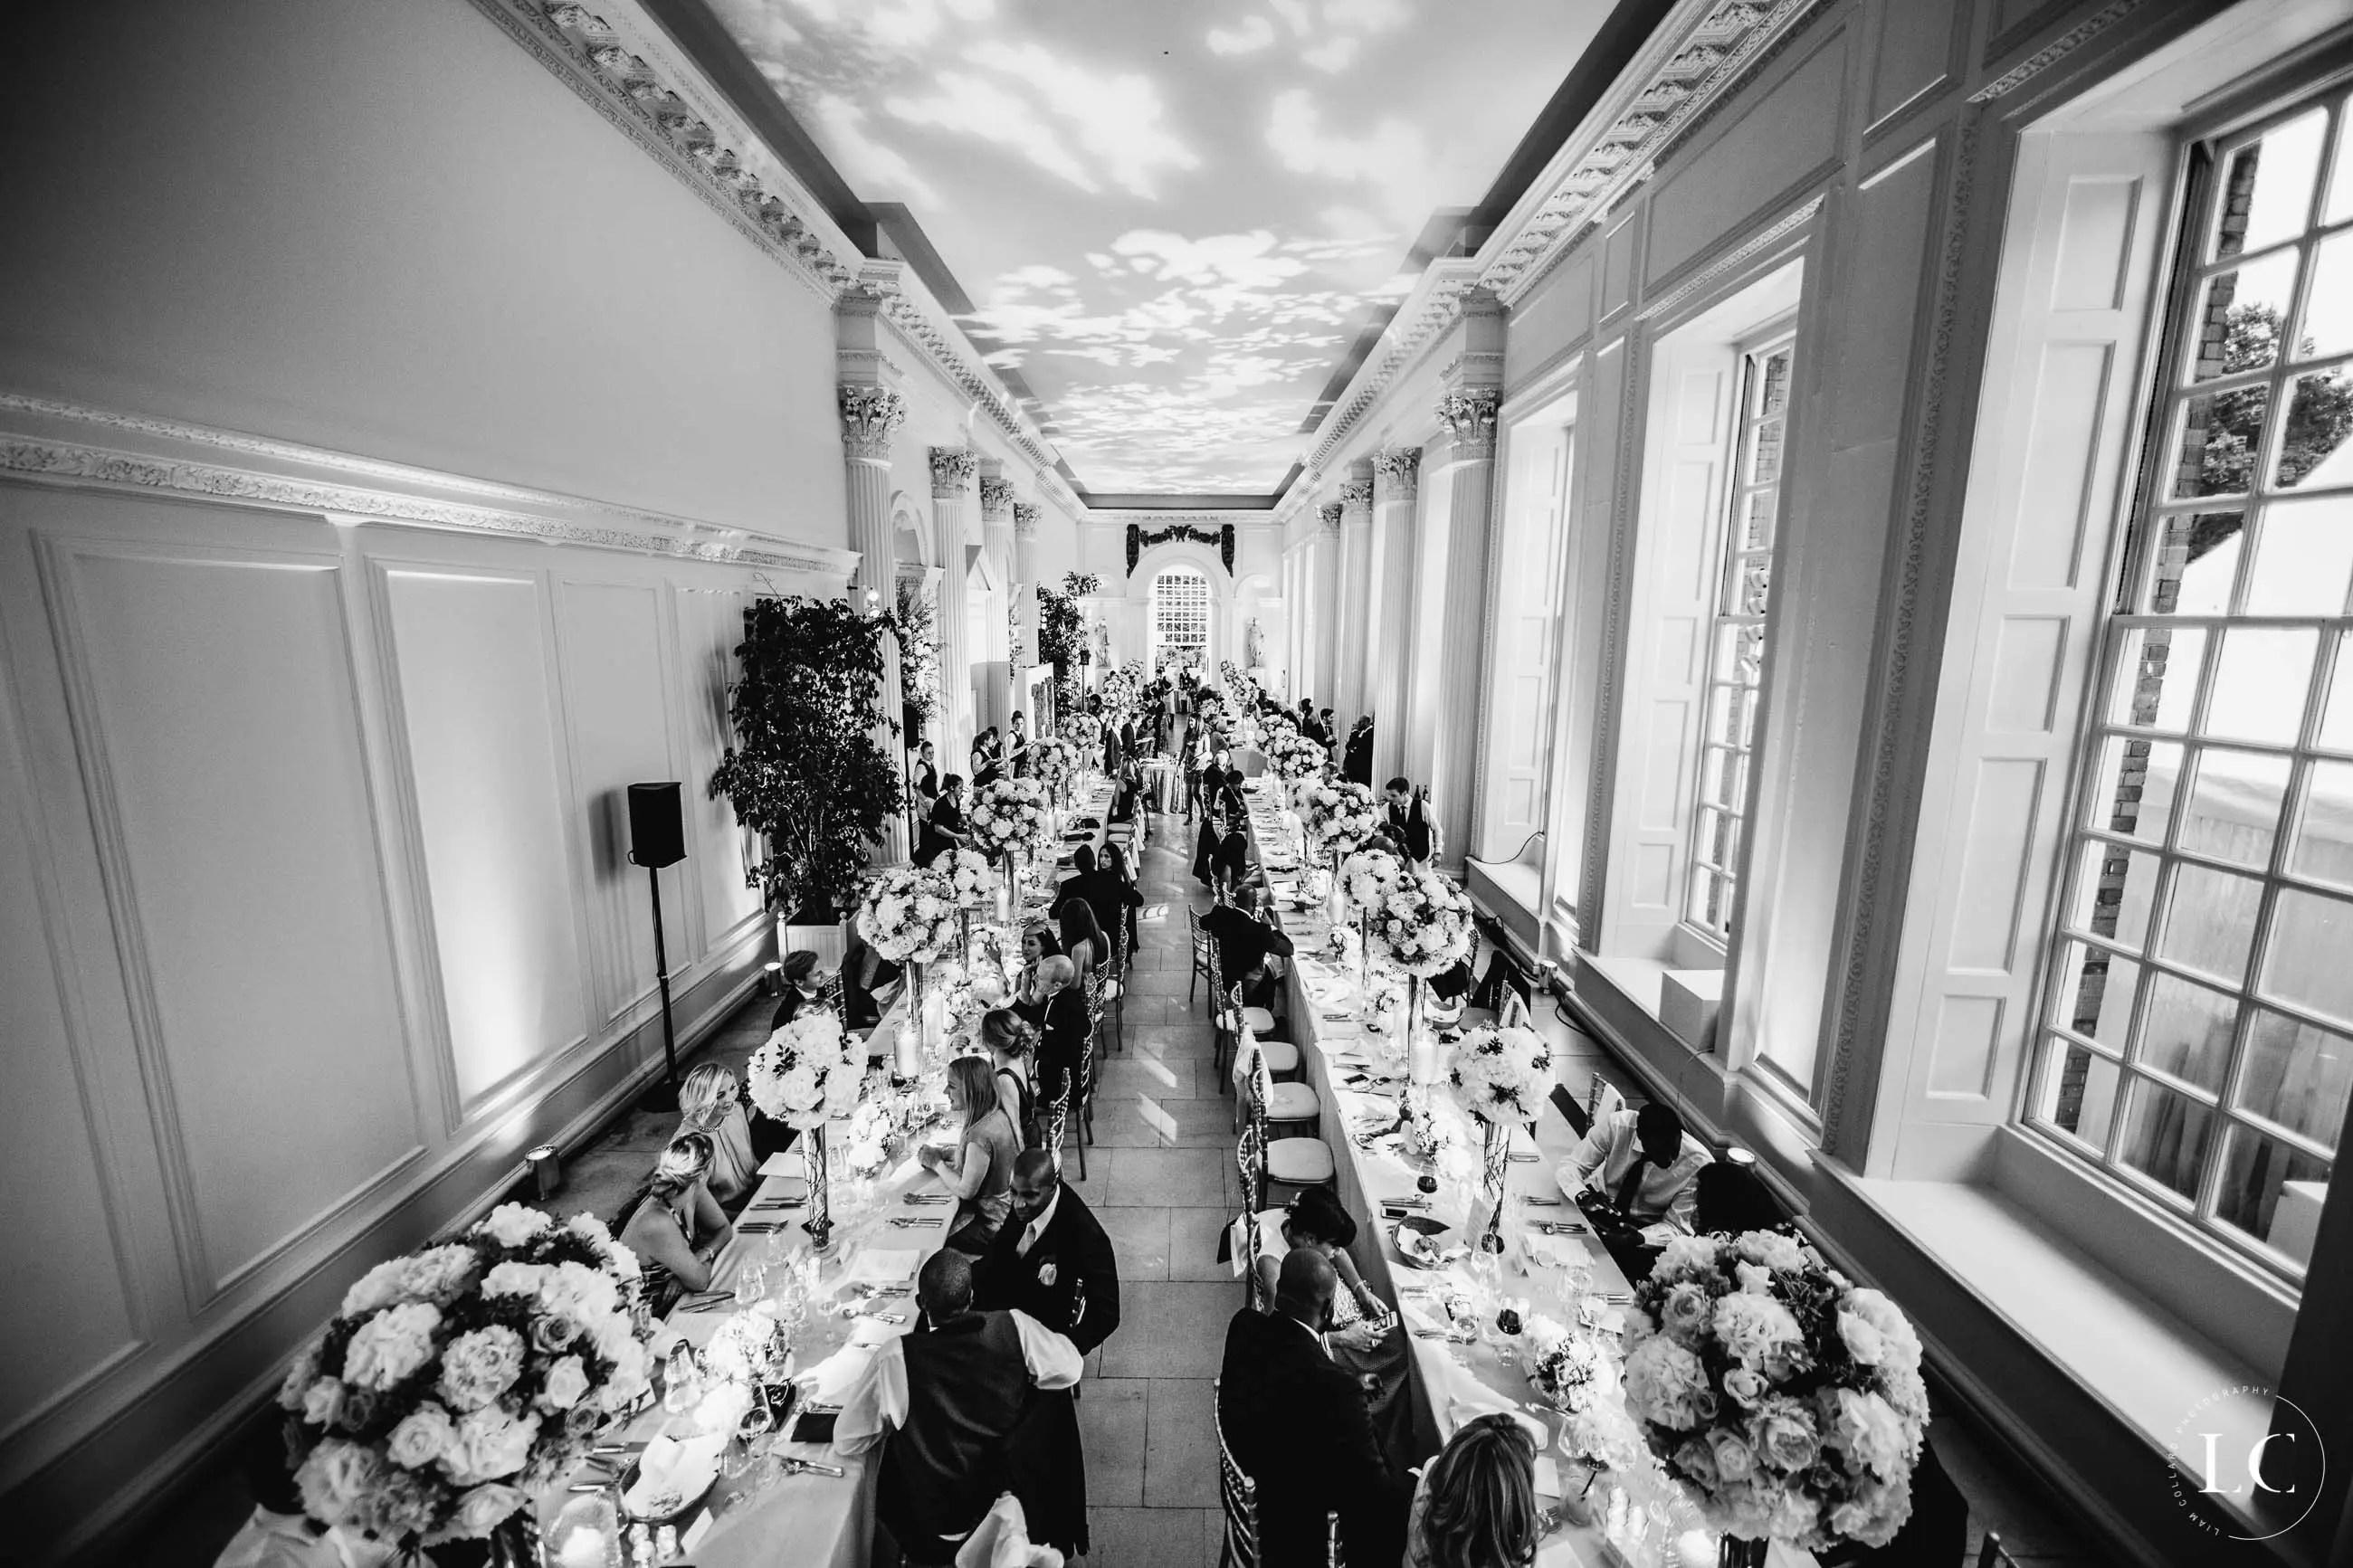 Wedding venue black and white